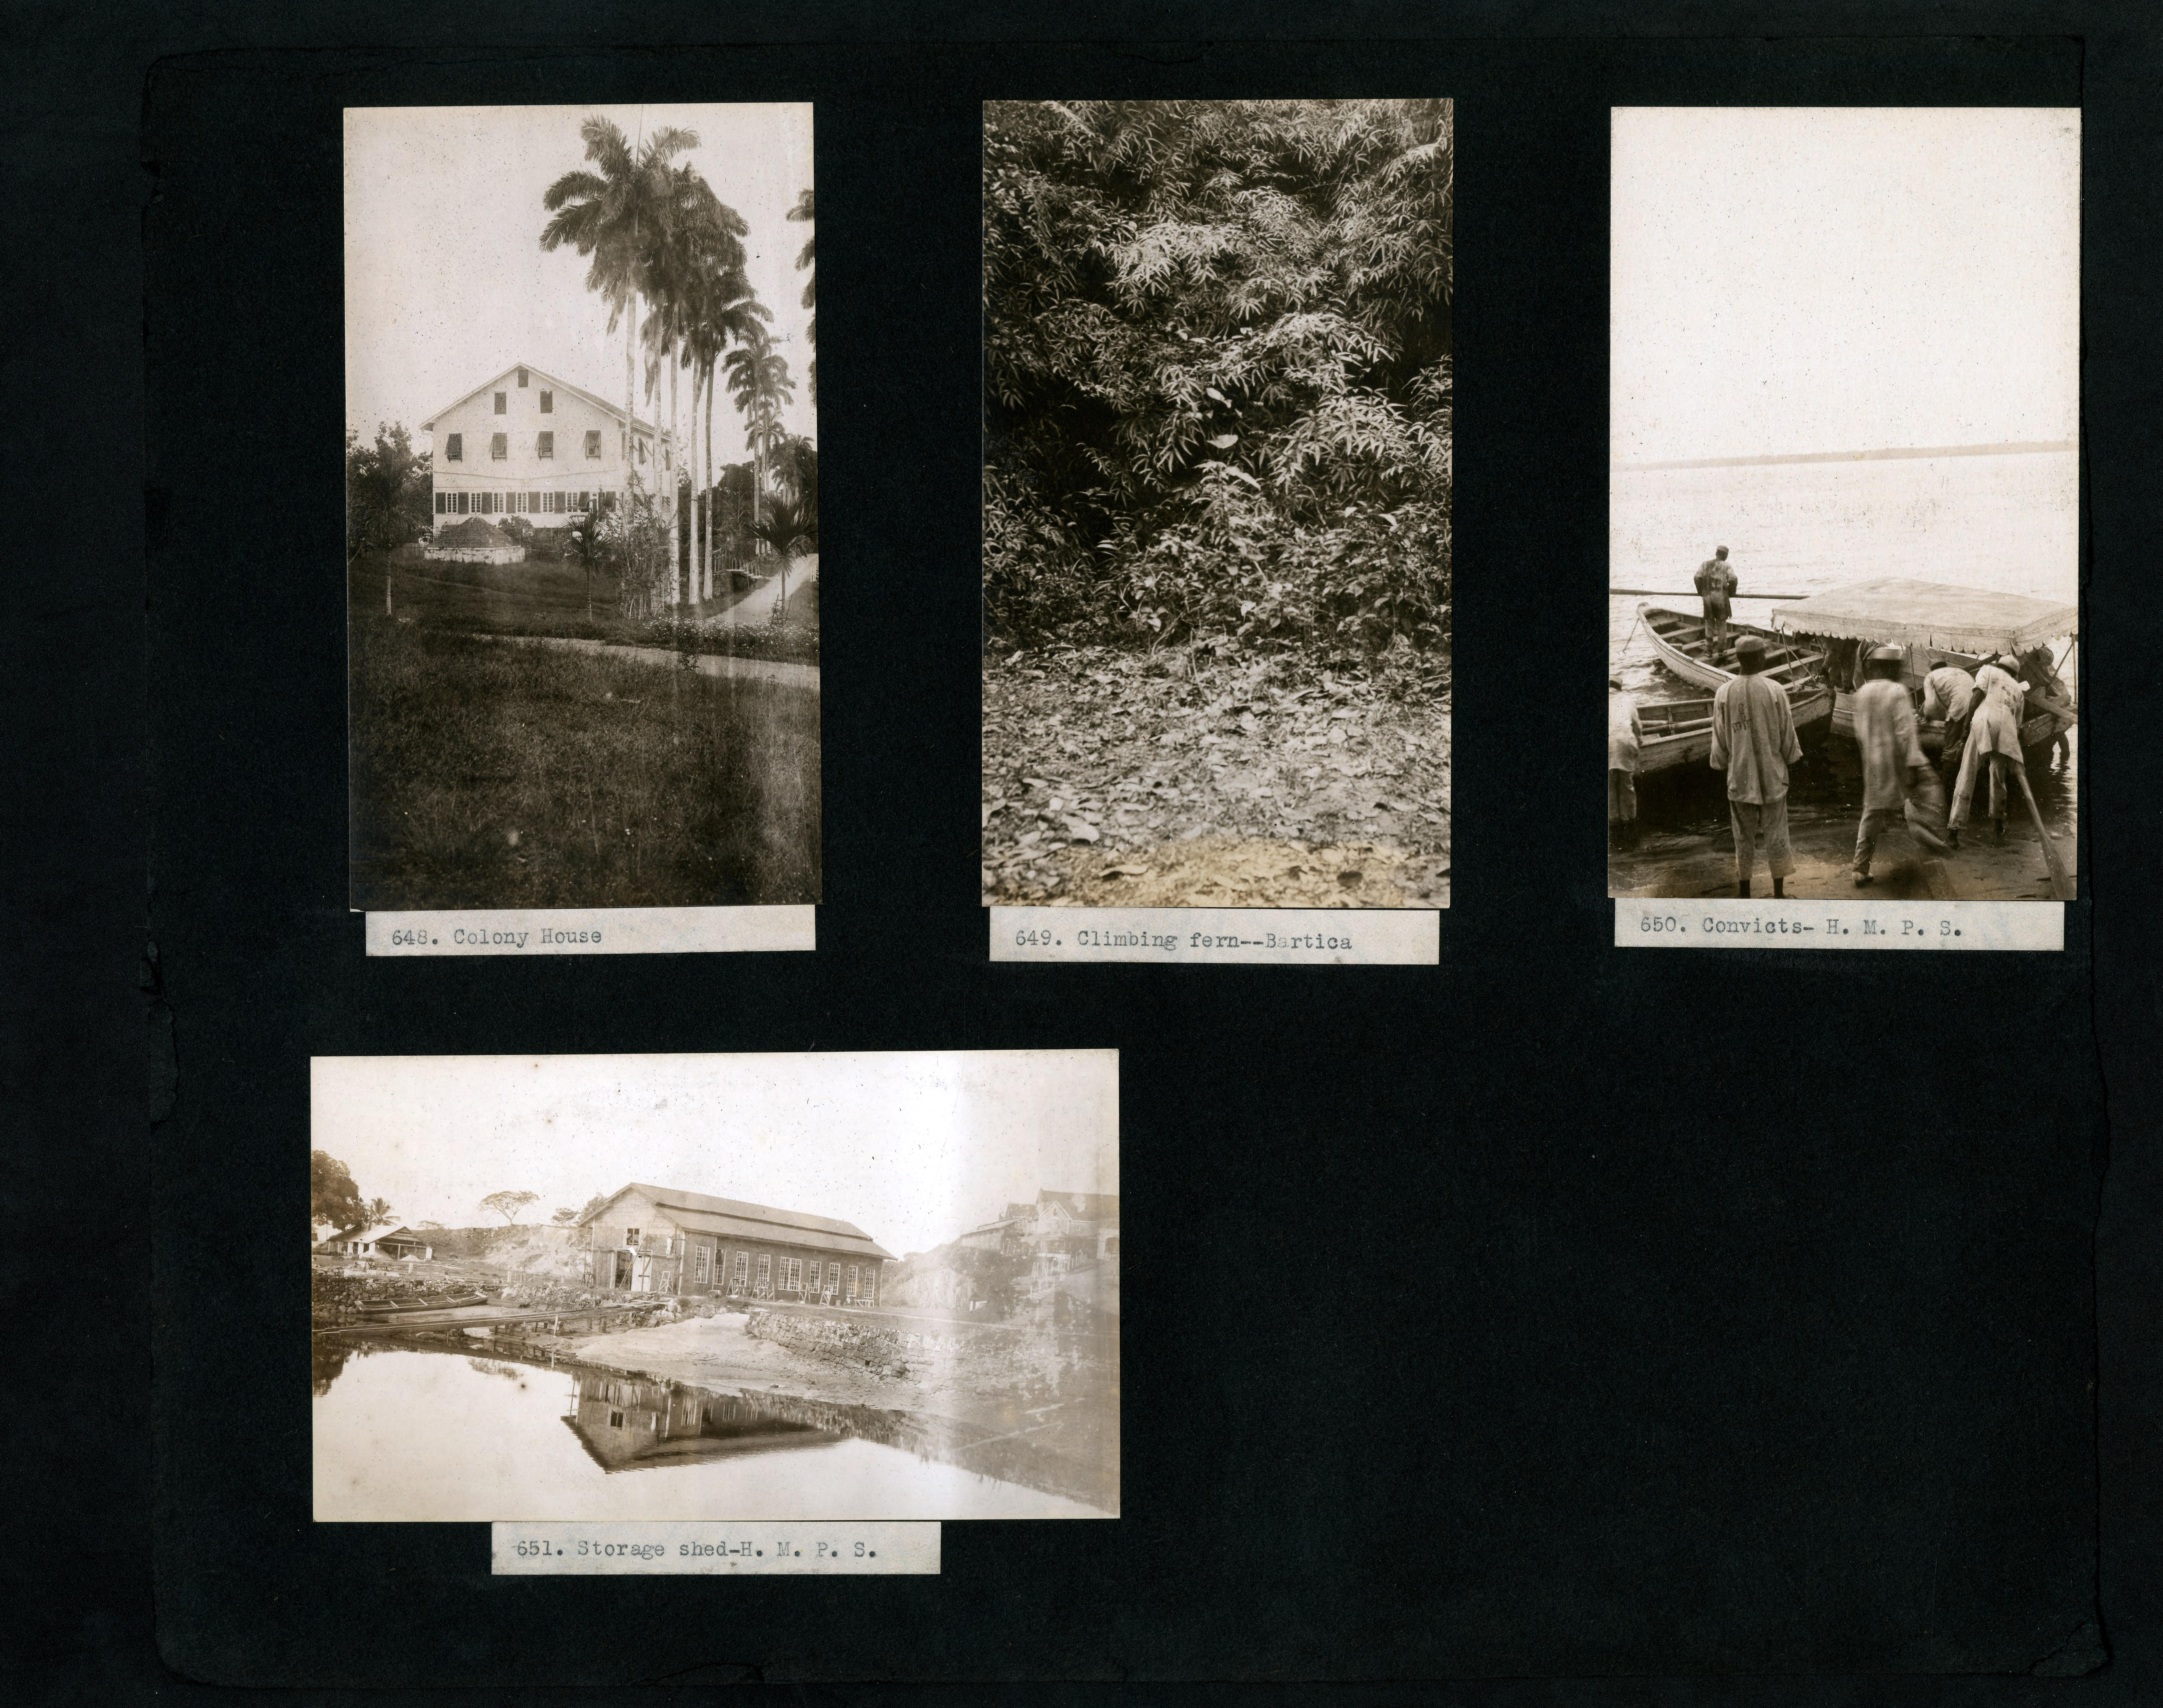 File:587--778; -1316A--1448 A. A. S. Hitch - British Guiana ... on